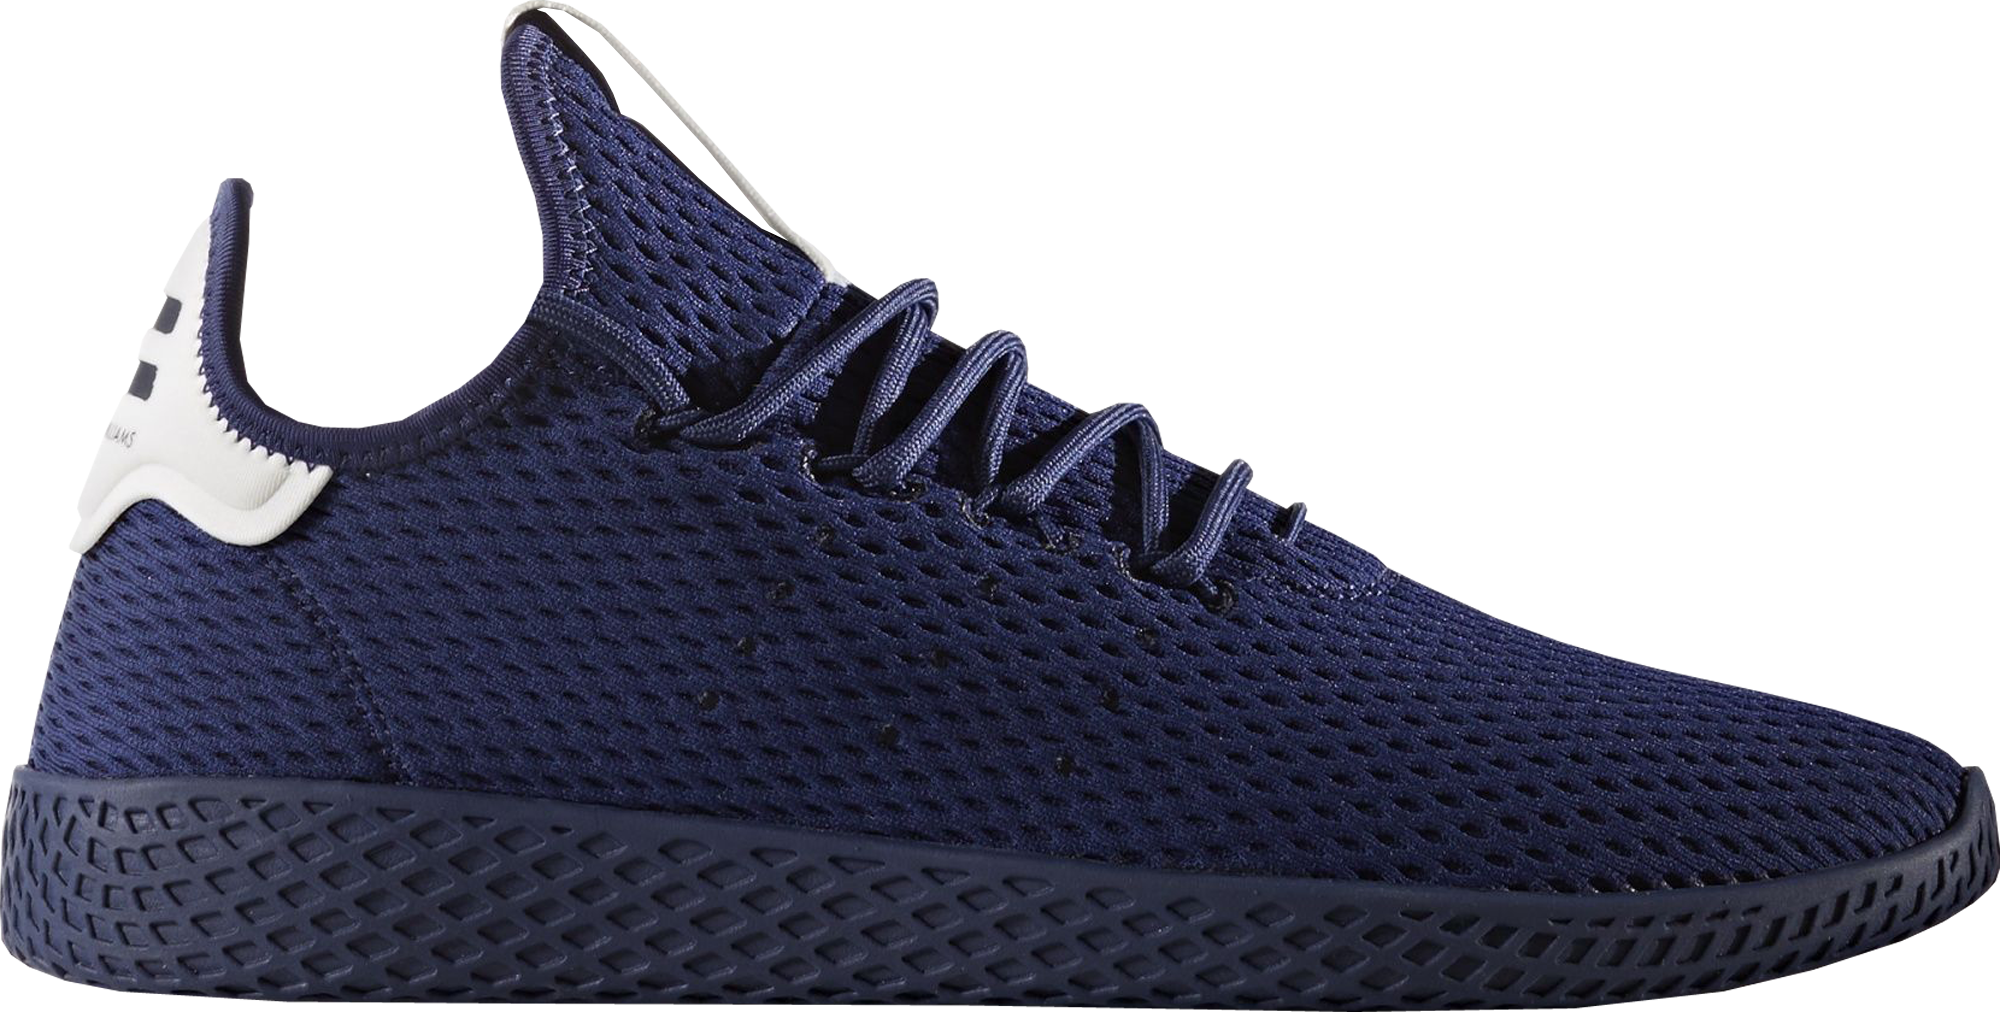 adidas Tennis Hu Pharrell Solid Dark Blue